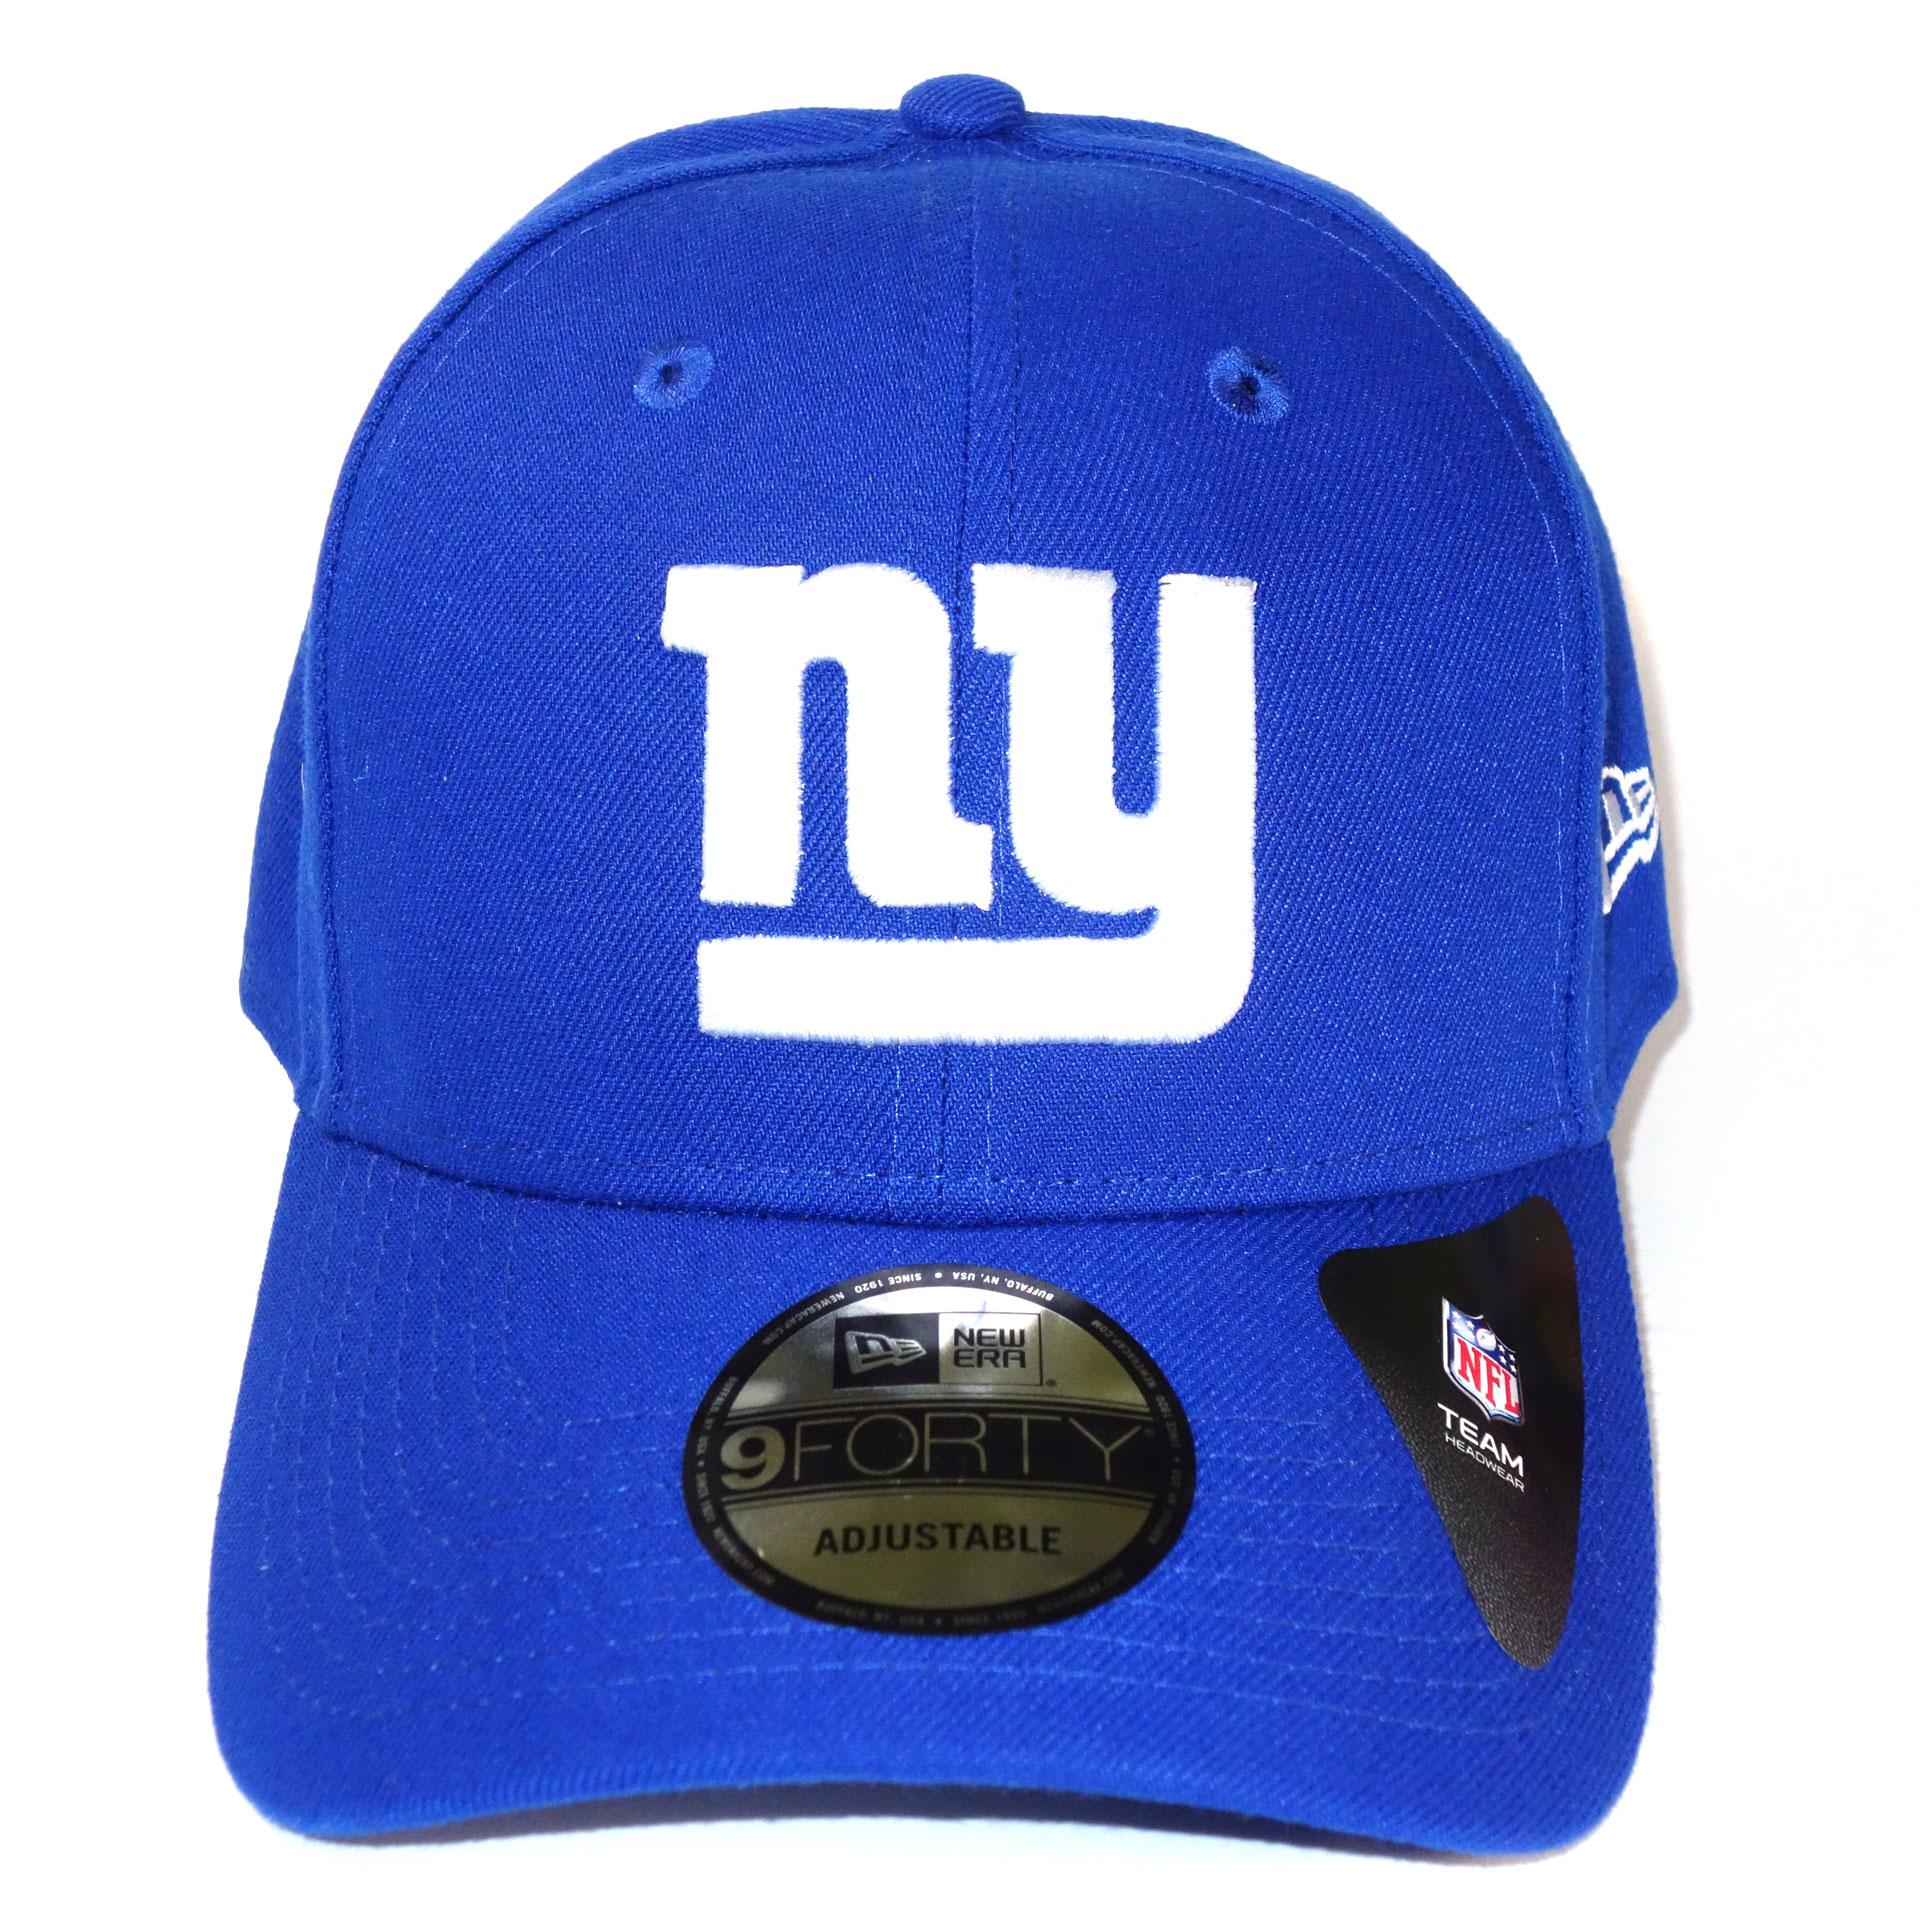 NFL New Era Cap New York Giants